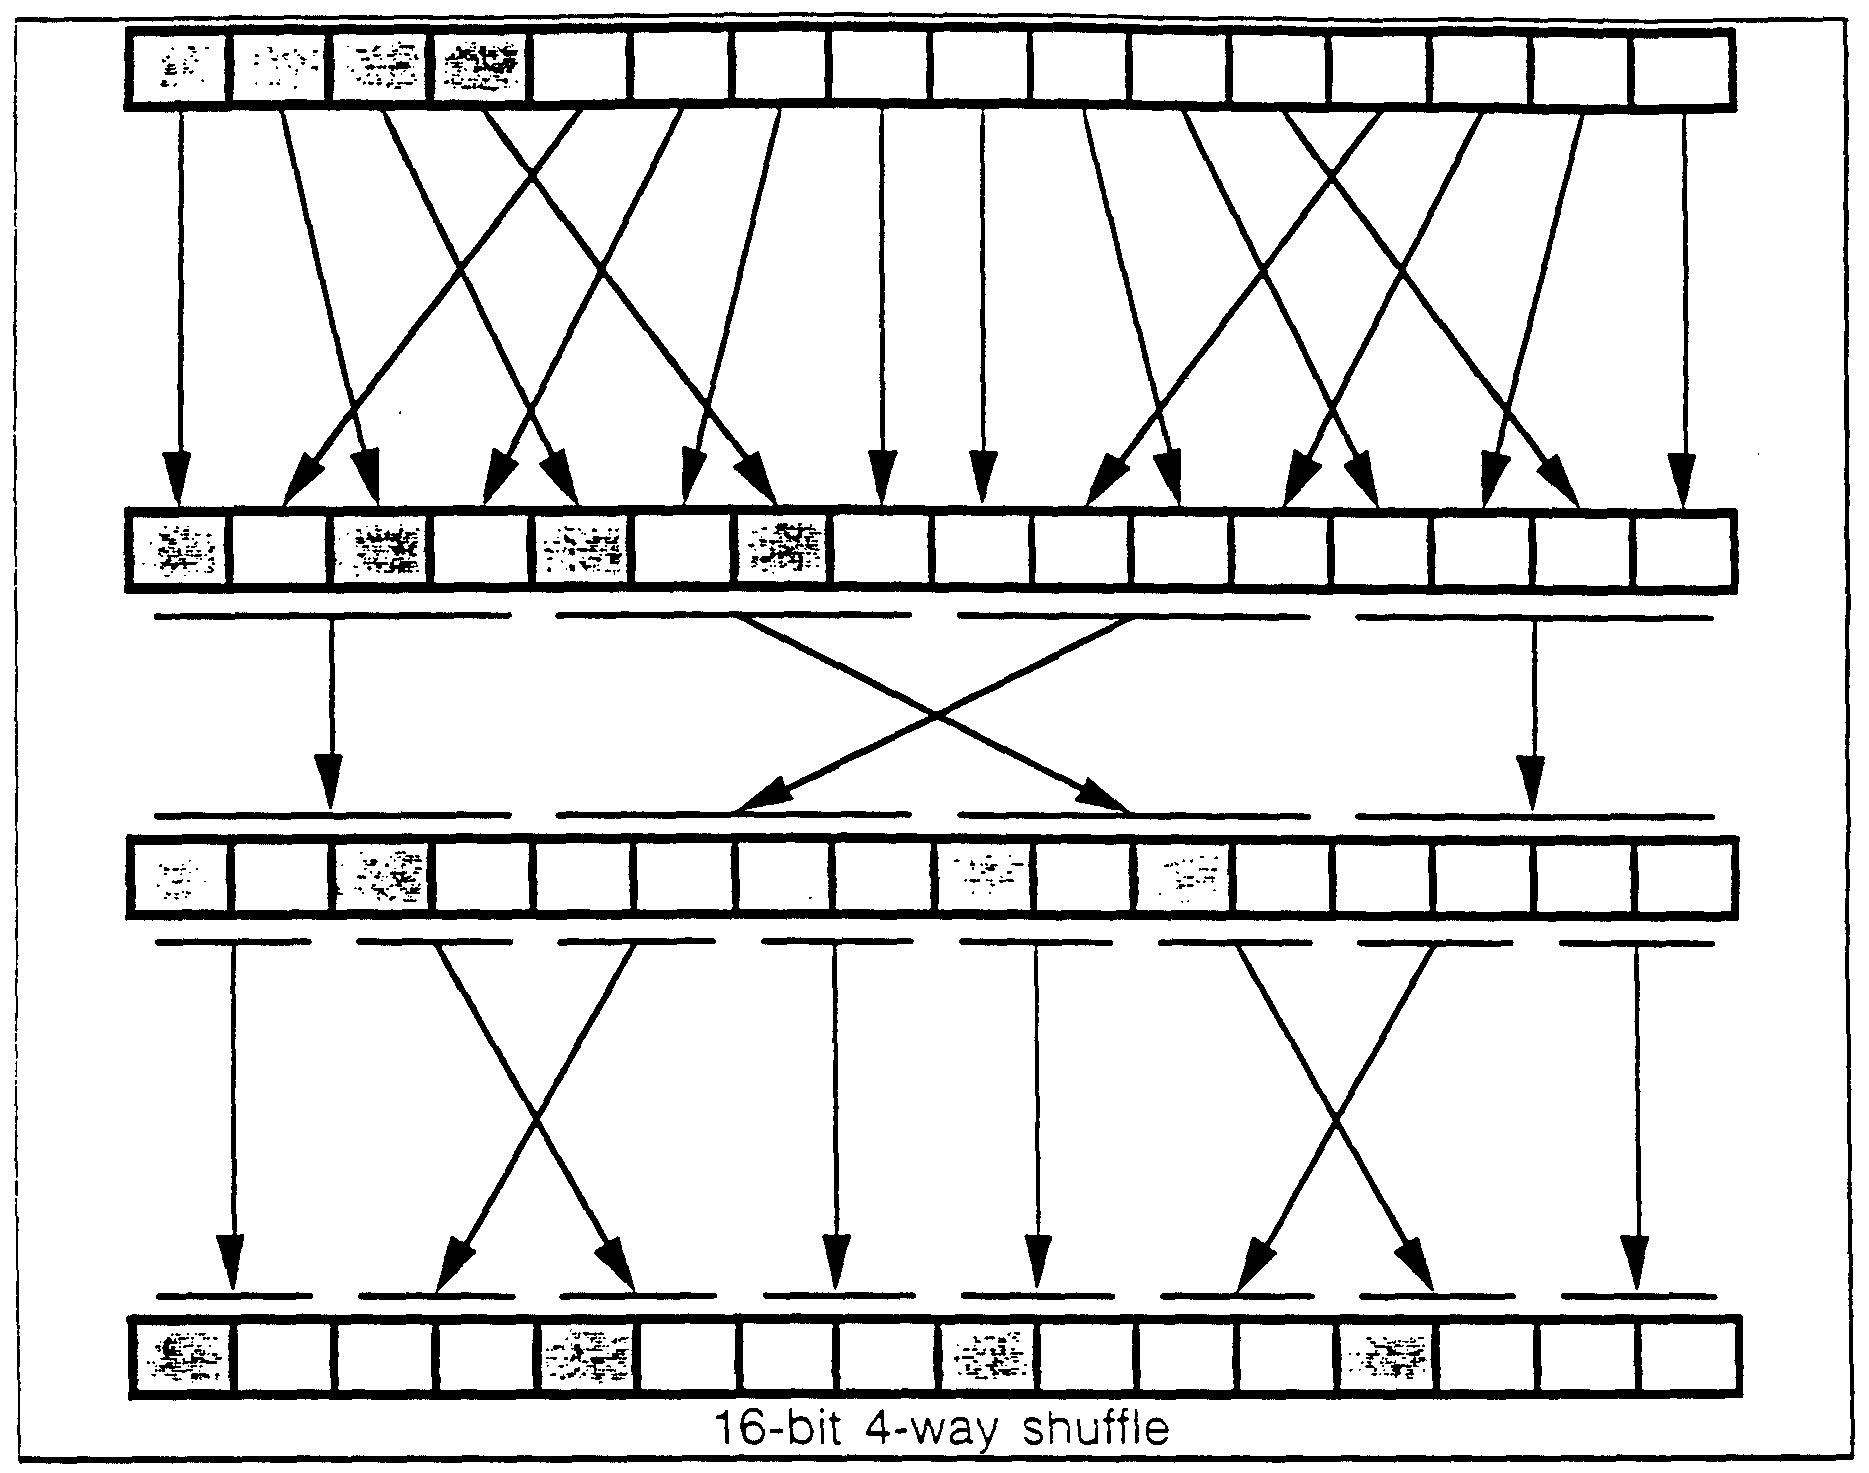 A Quad Receptacle Wiring - All Diagram Schematics A Quad Receptacle Wiring on